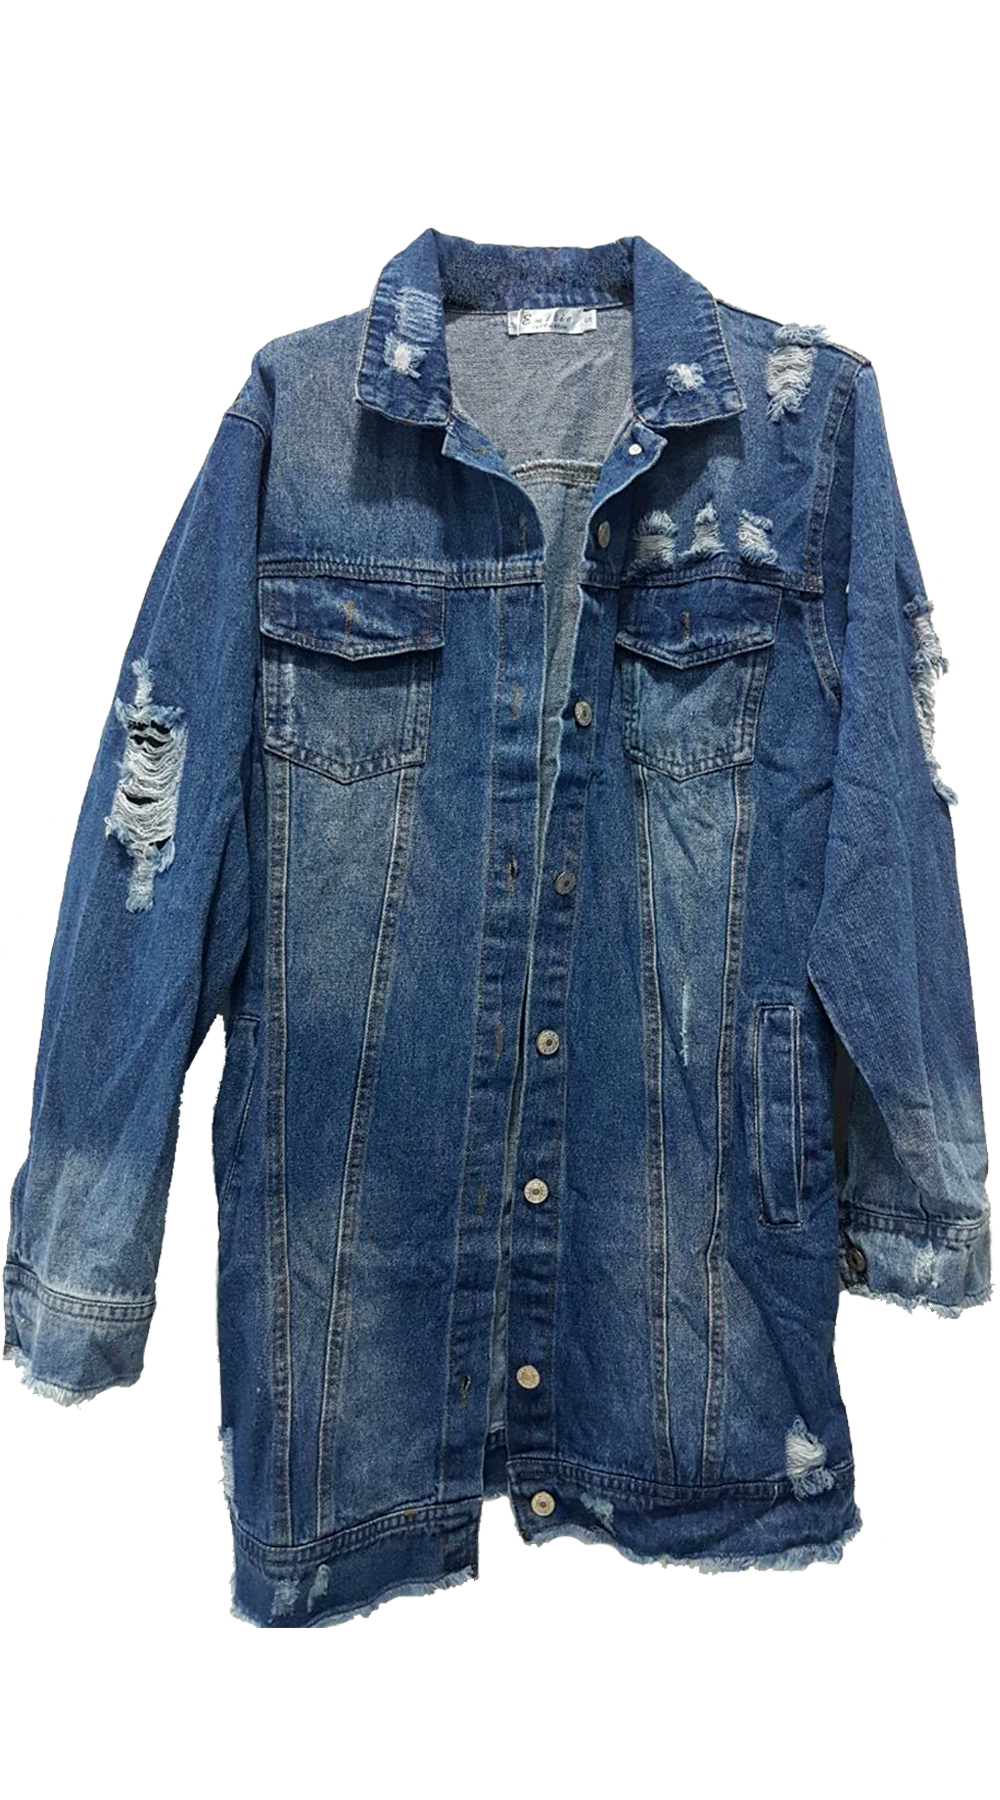 8b208ac8507 Denim Jacket Kate | Βρες μεγάλη ποικιλία σε γυναικεία μπουφάν! |  missreina.com